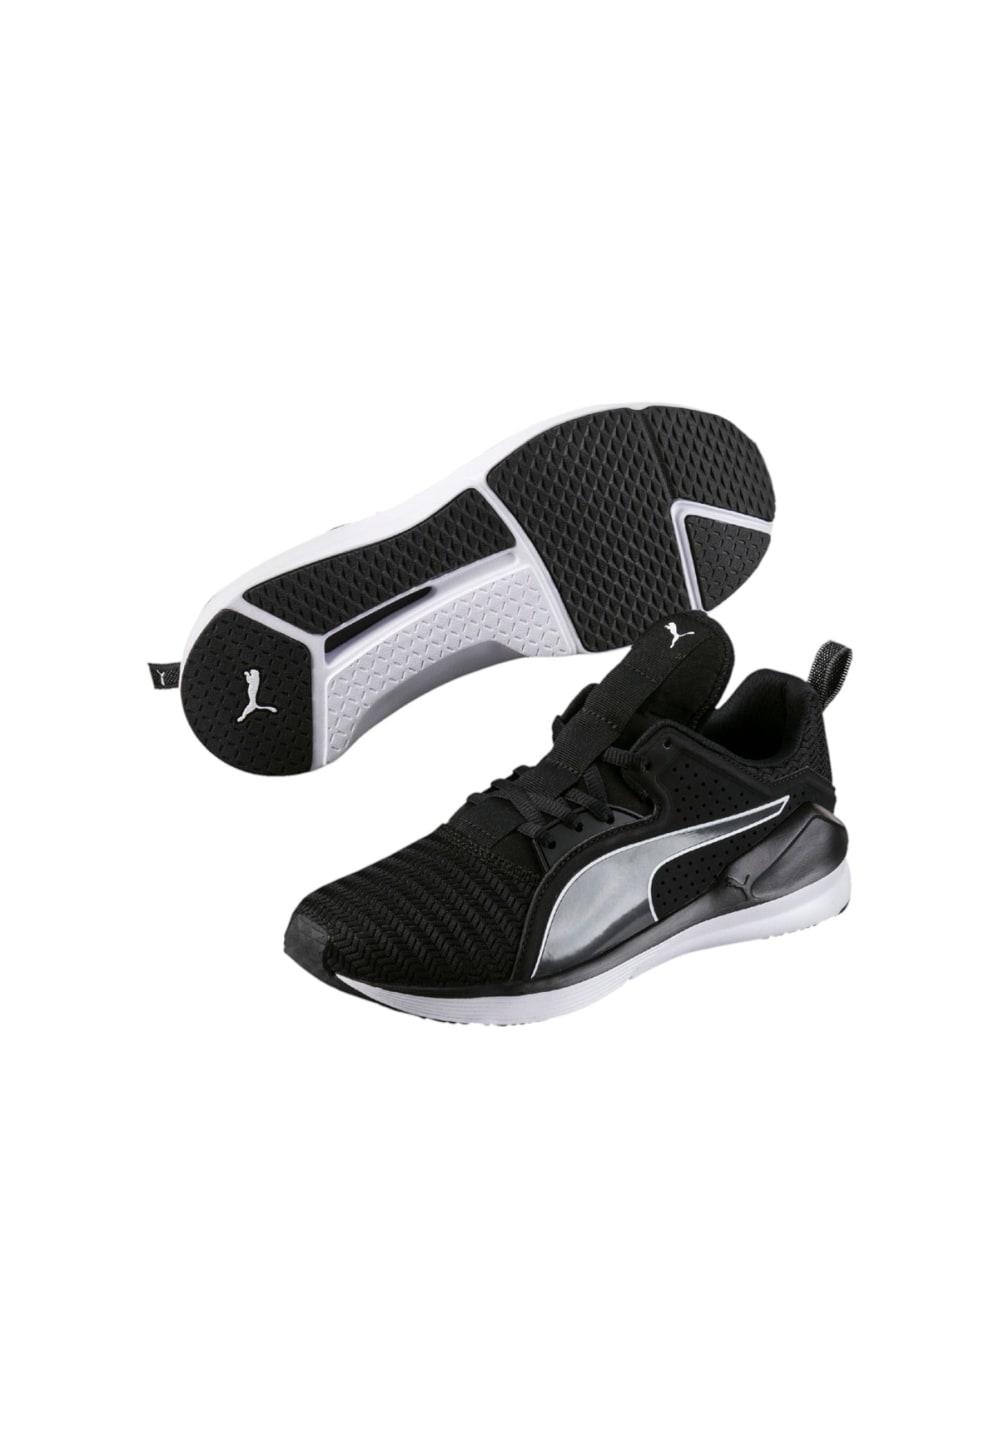 chaussures puma fitness femme